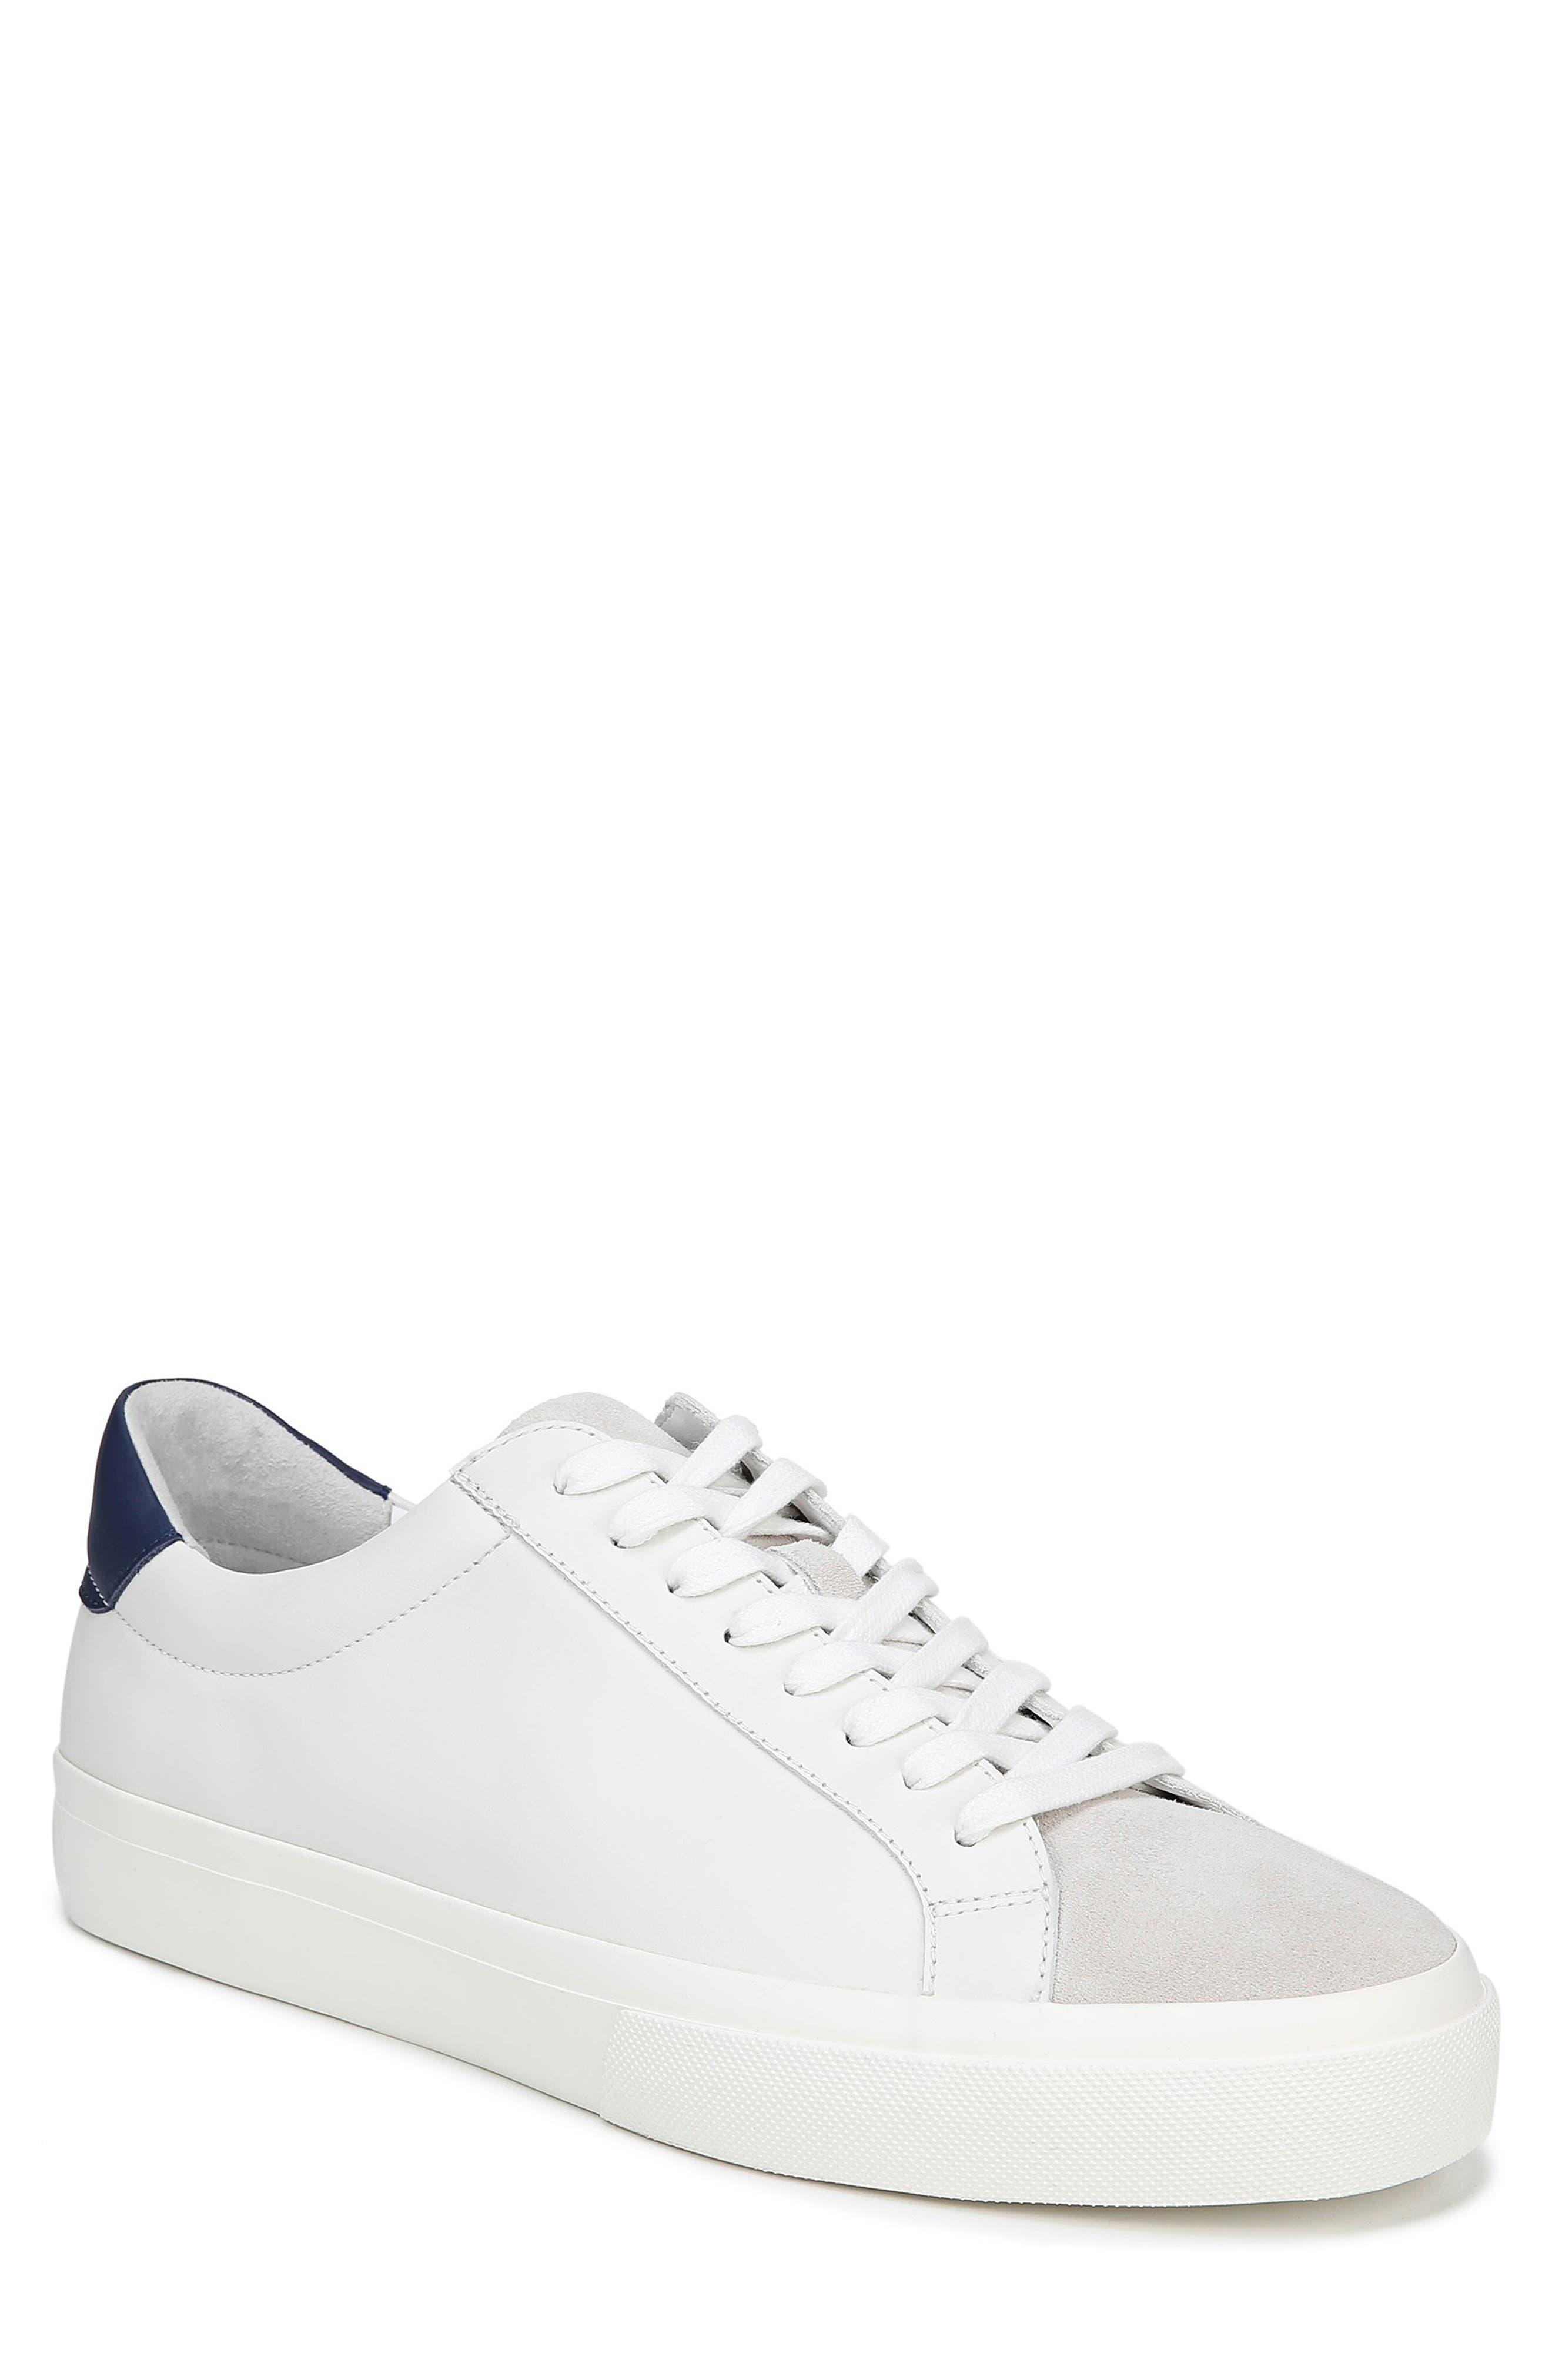 VINCE, Fulton Sneaker, Main thumbnail 1, color, WHITE